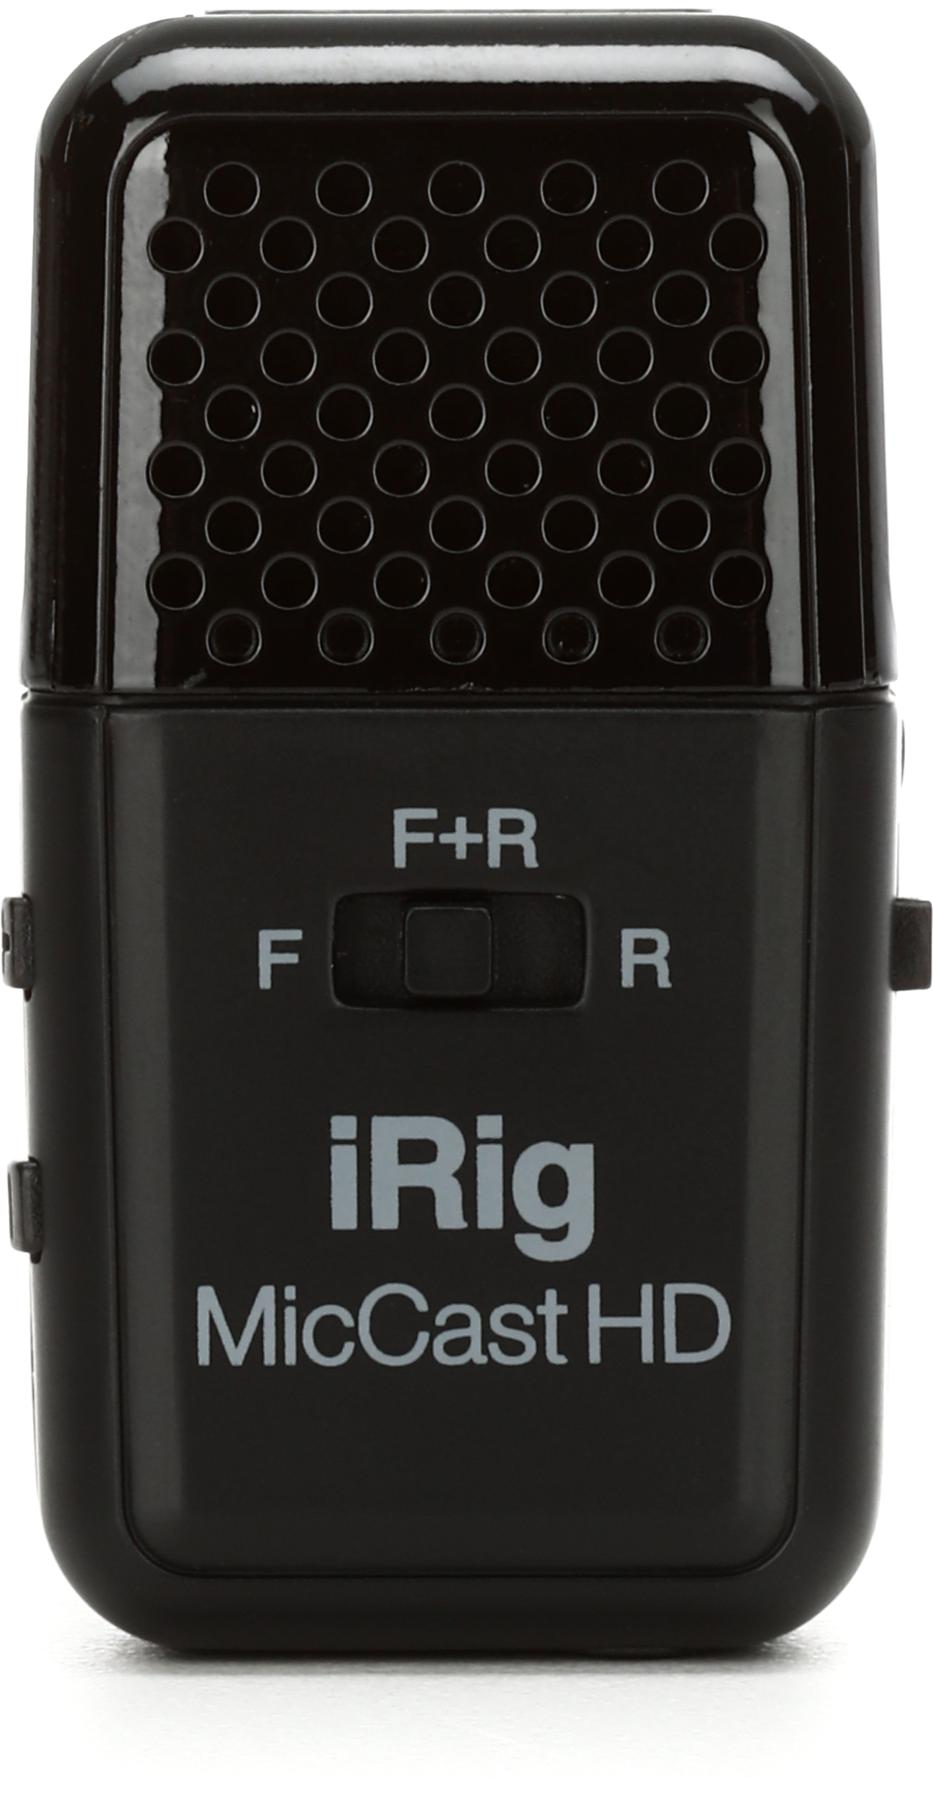 3. IK Multimedia iRig Mic Cast HD iOS Microphone